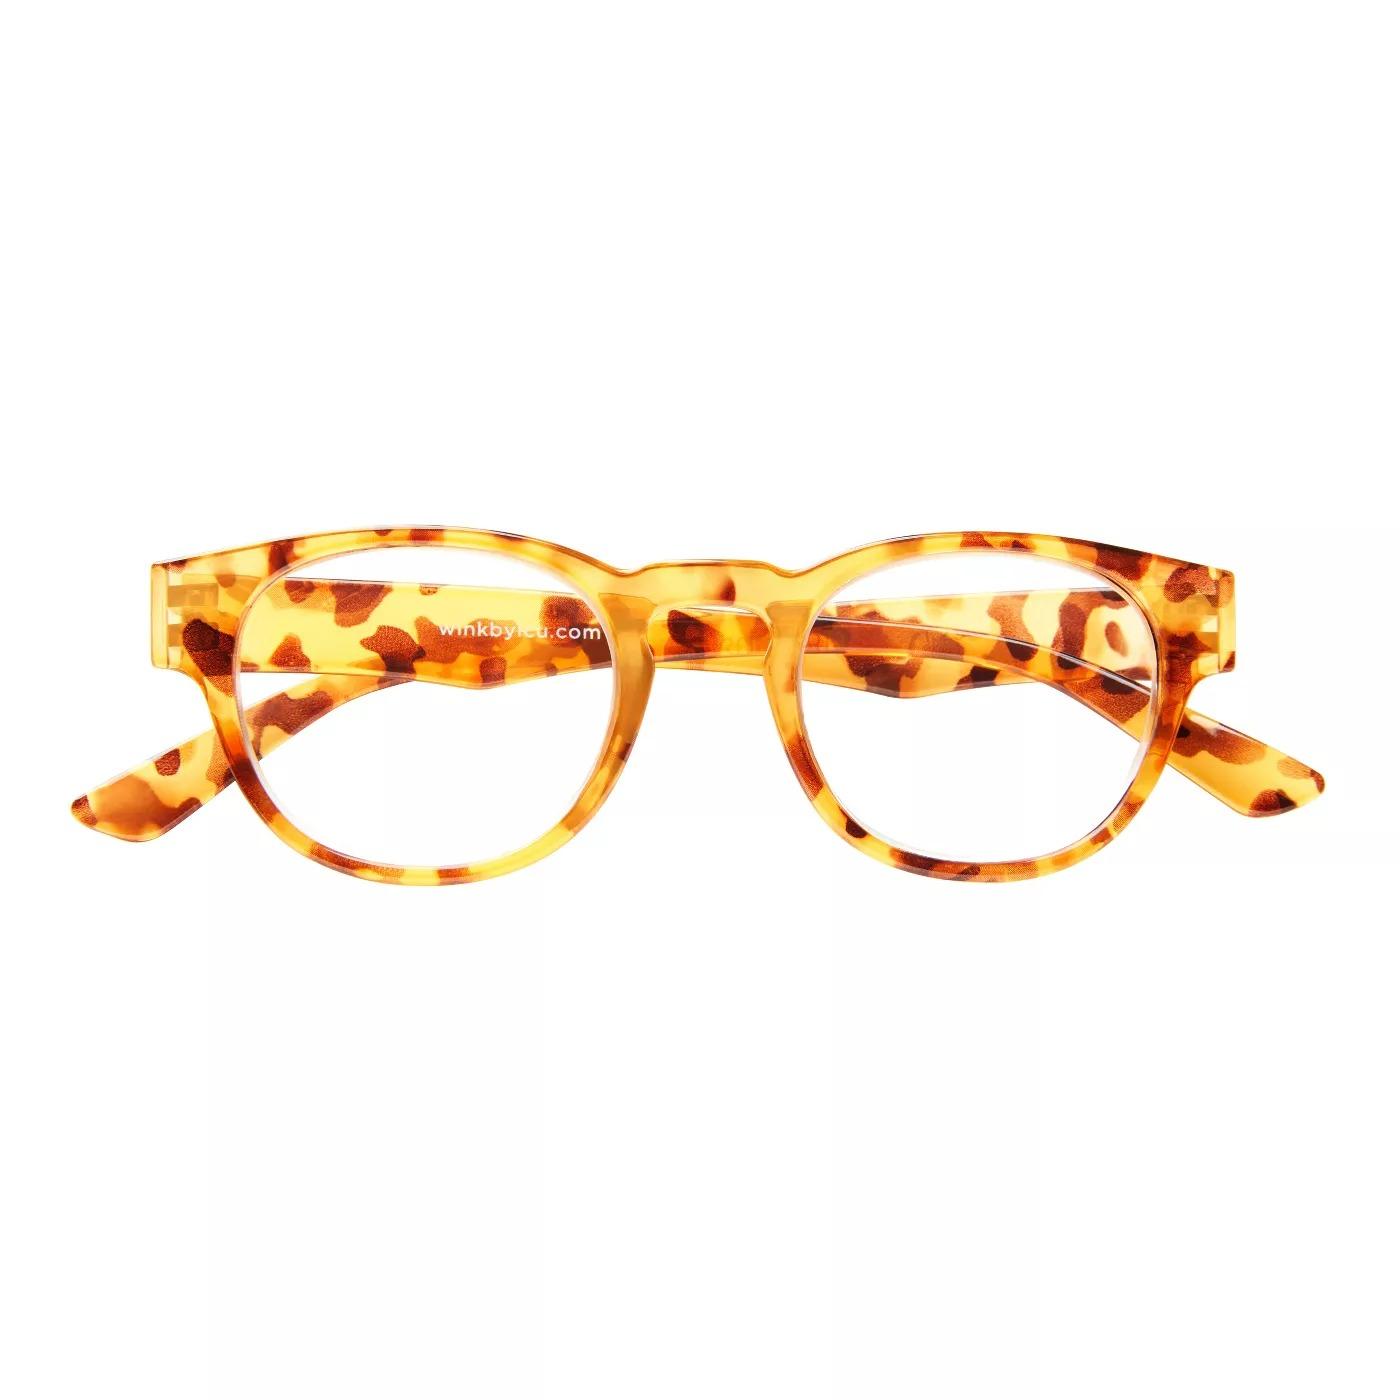 ICU Wink Rocklin Tortoise Floral Reading Glasses